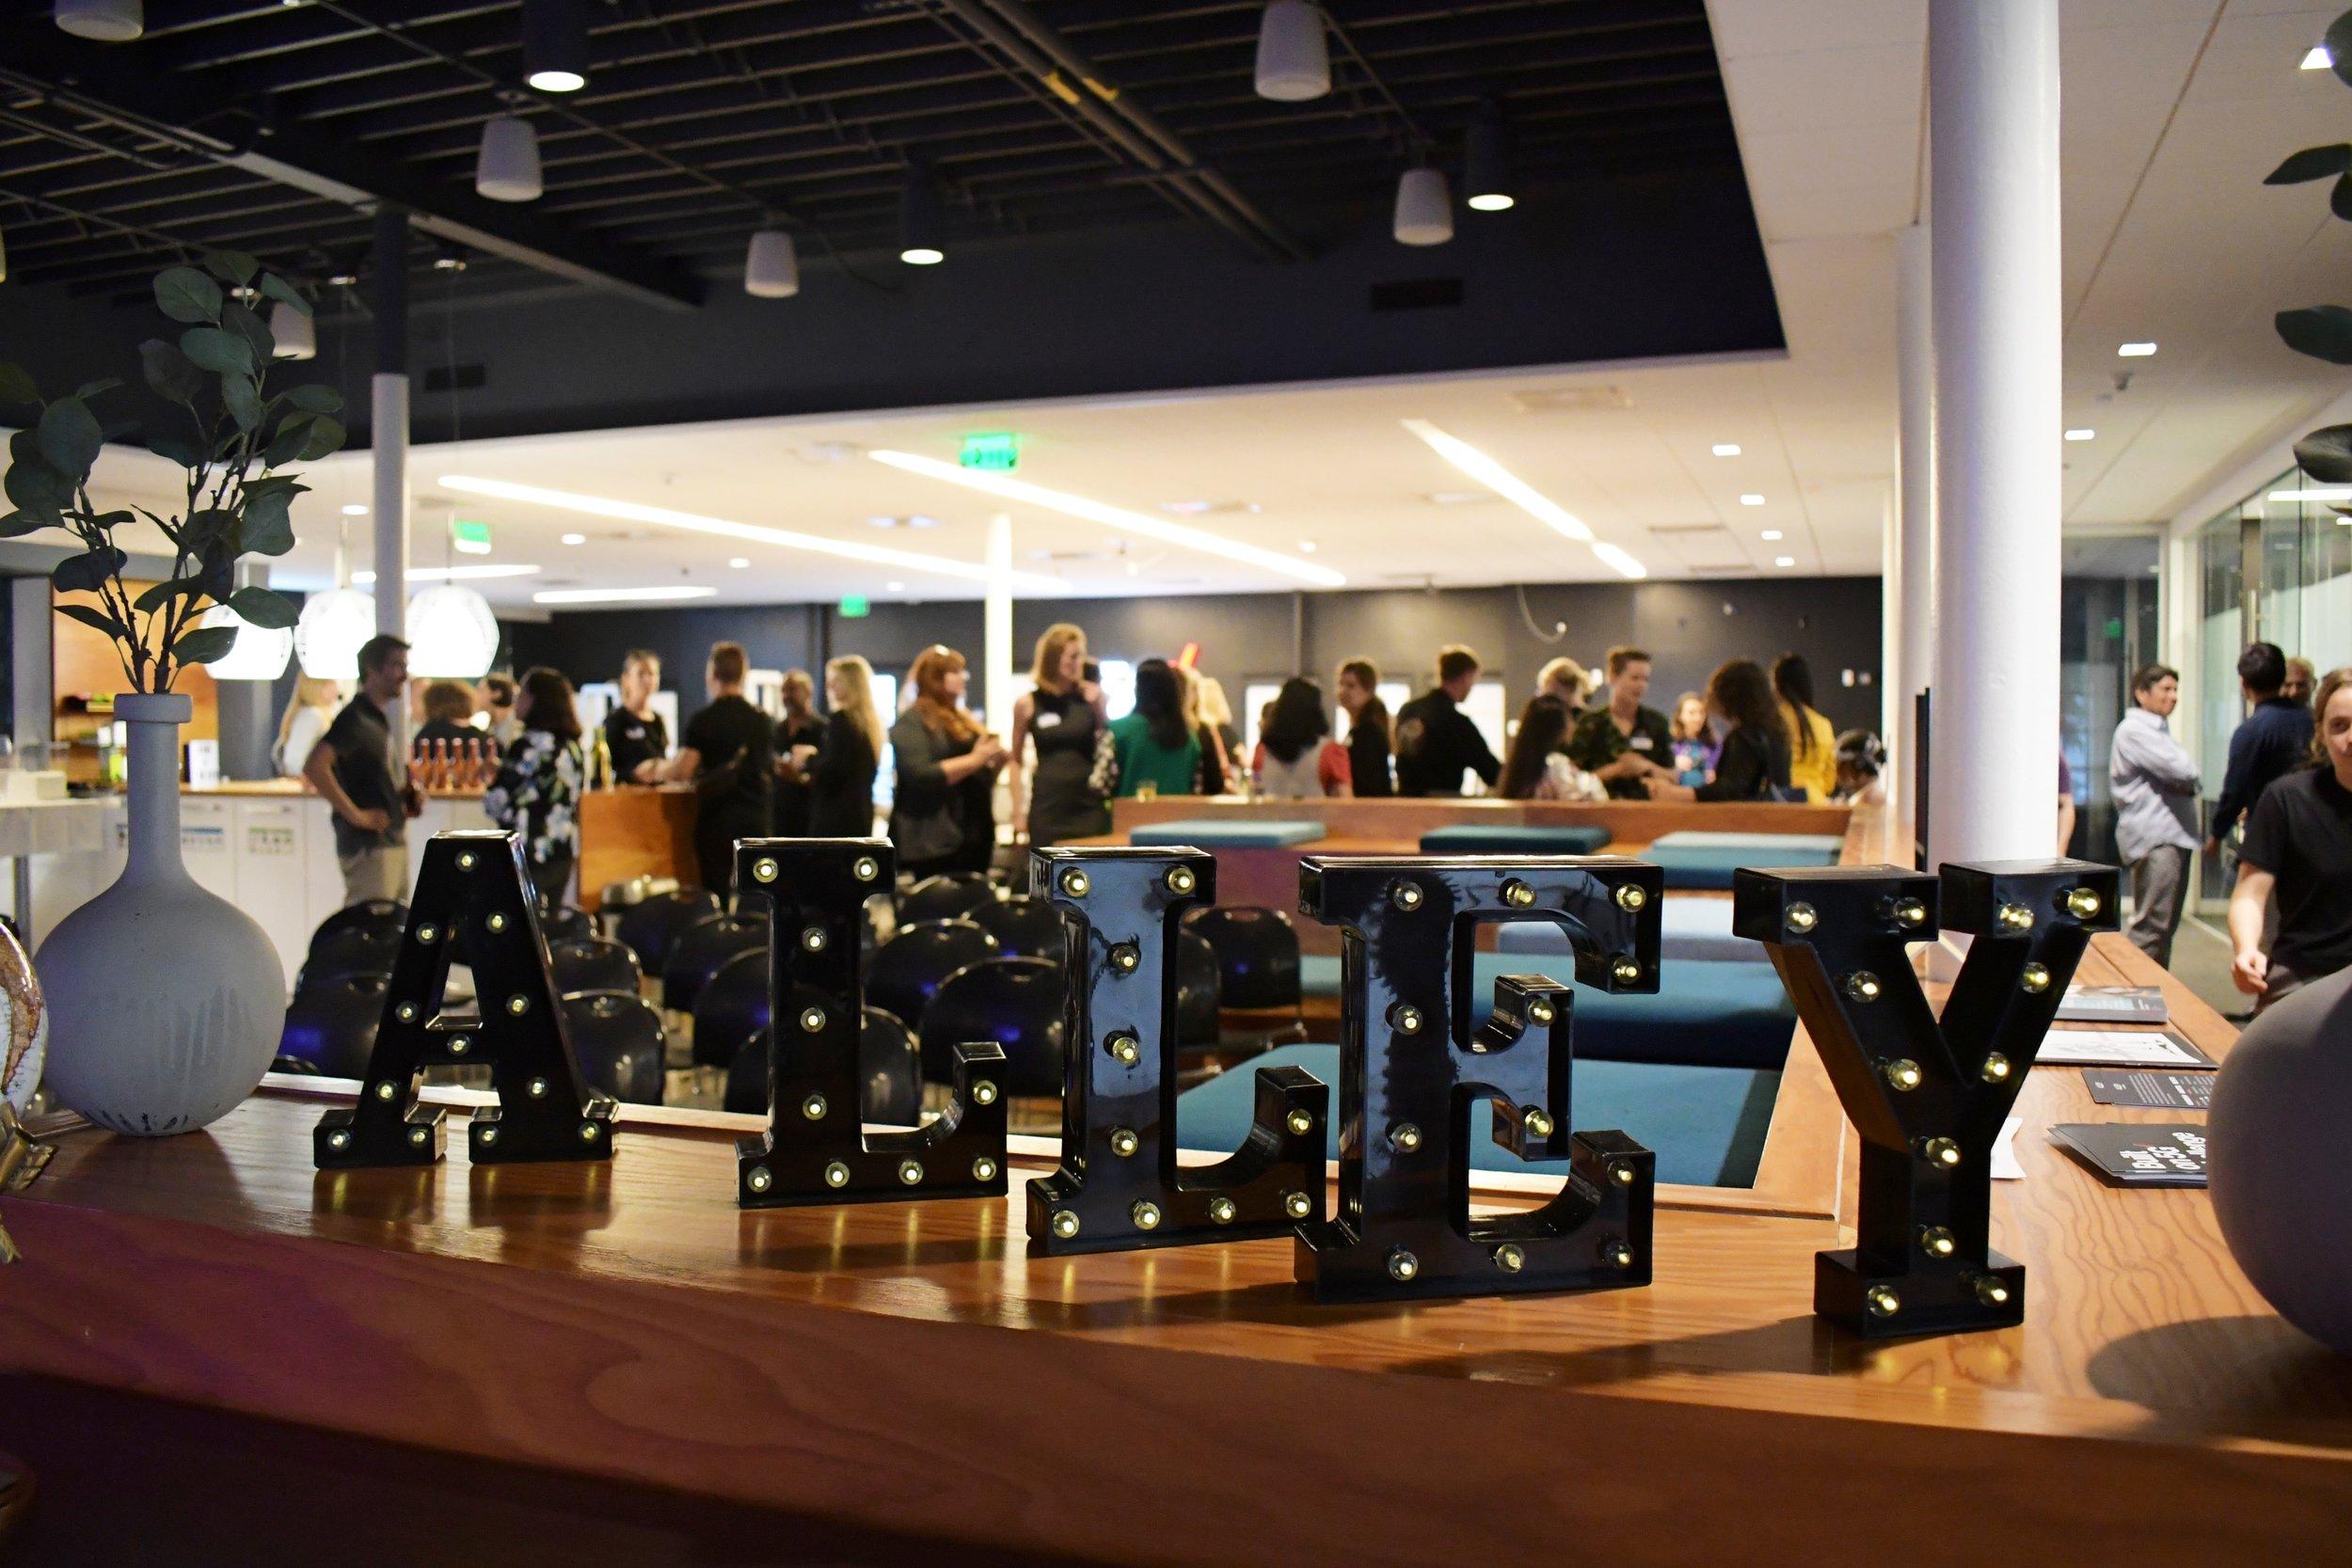 WXR-Fund-Women-In-XR-Spatial-Computing6.jpg